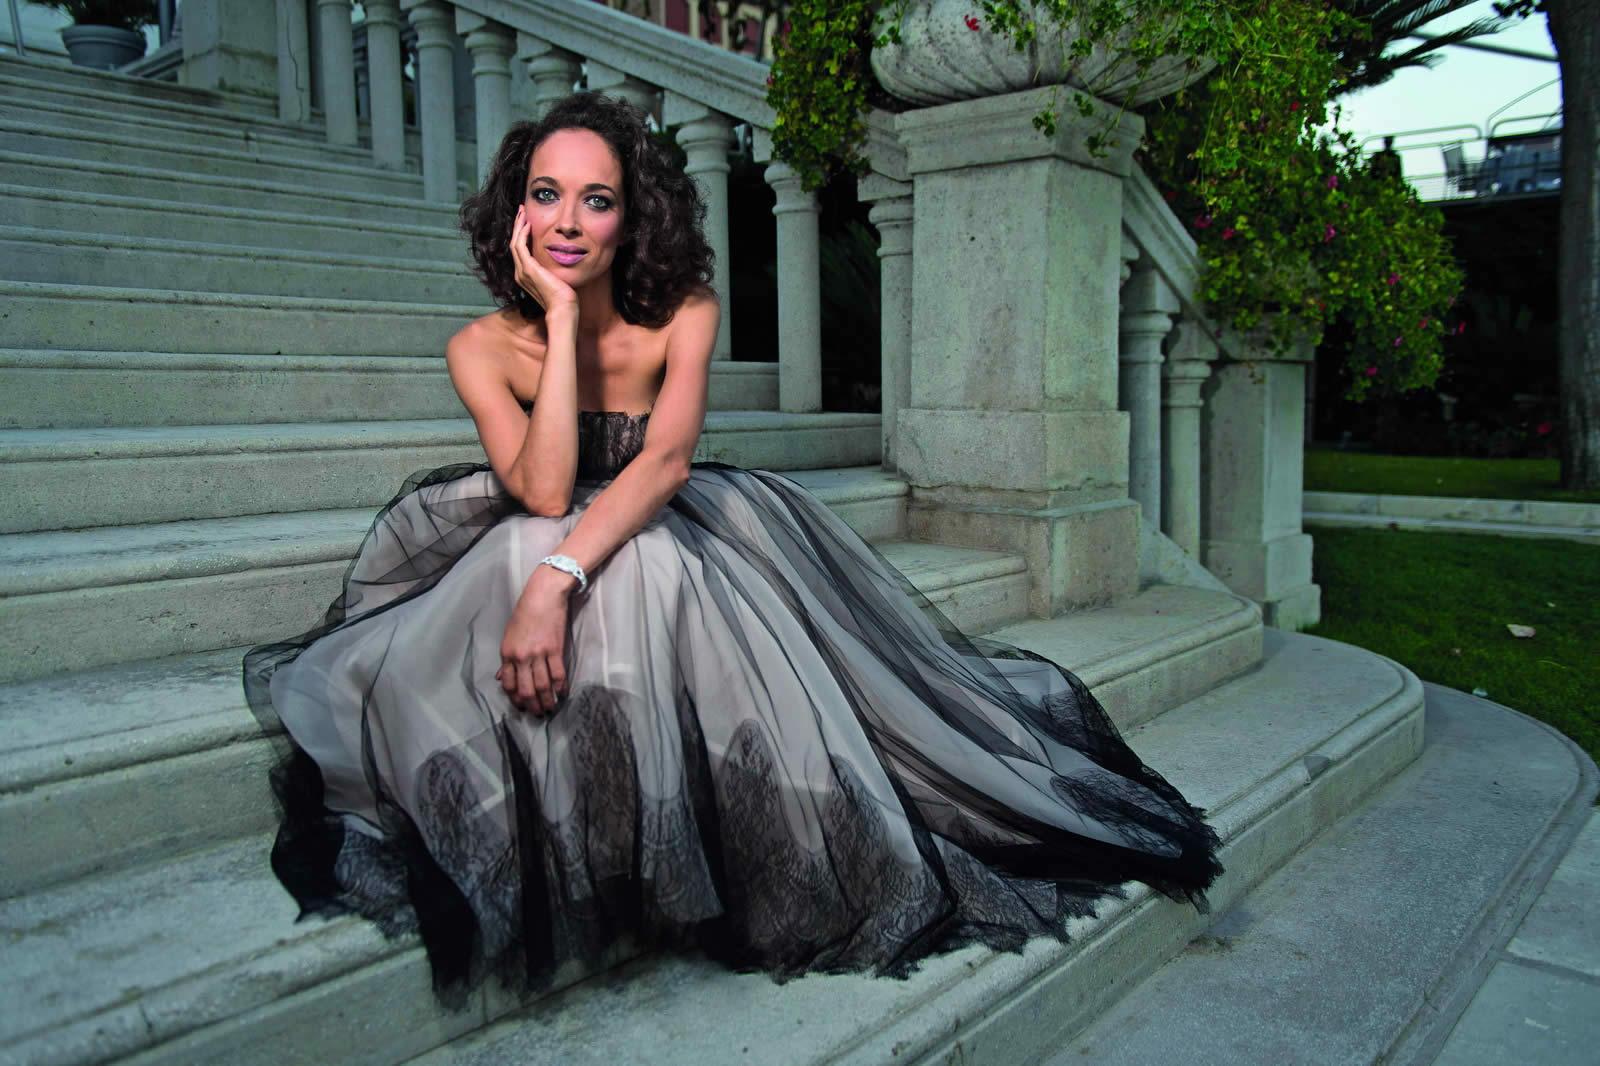 interview-actrice-realisatrice-carmen-chaplin-idee-luxe